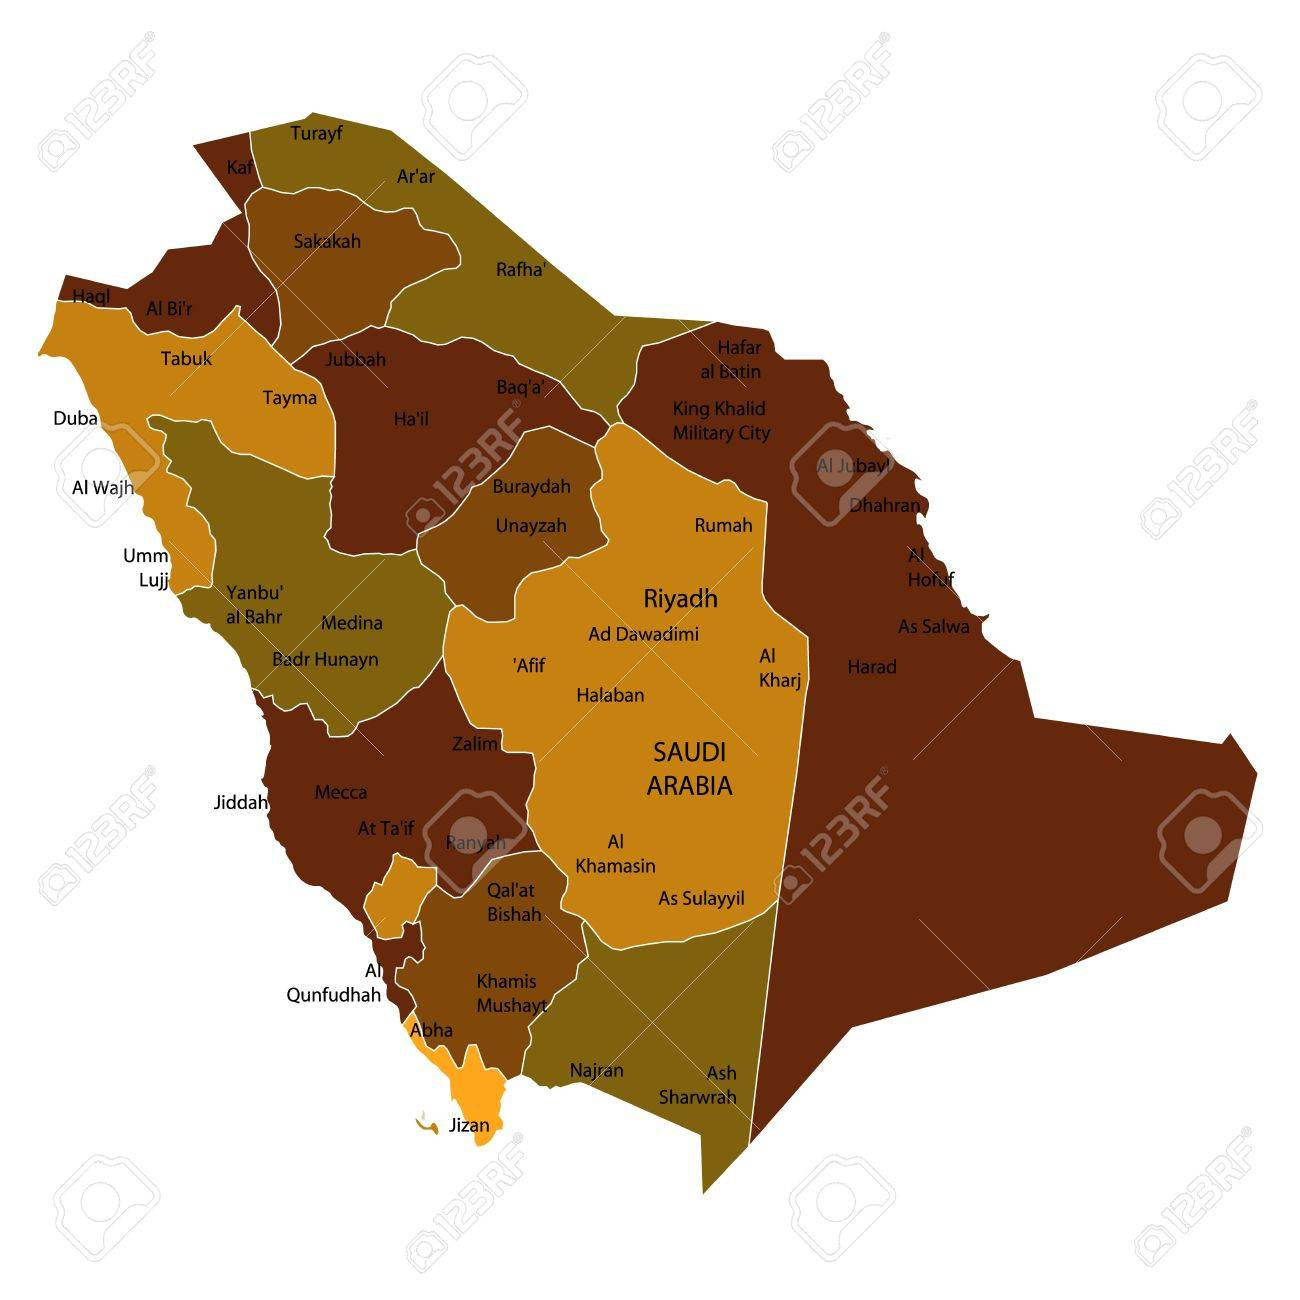 Saudi Arabia Stock Vector - 14844163